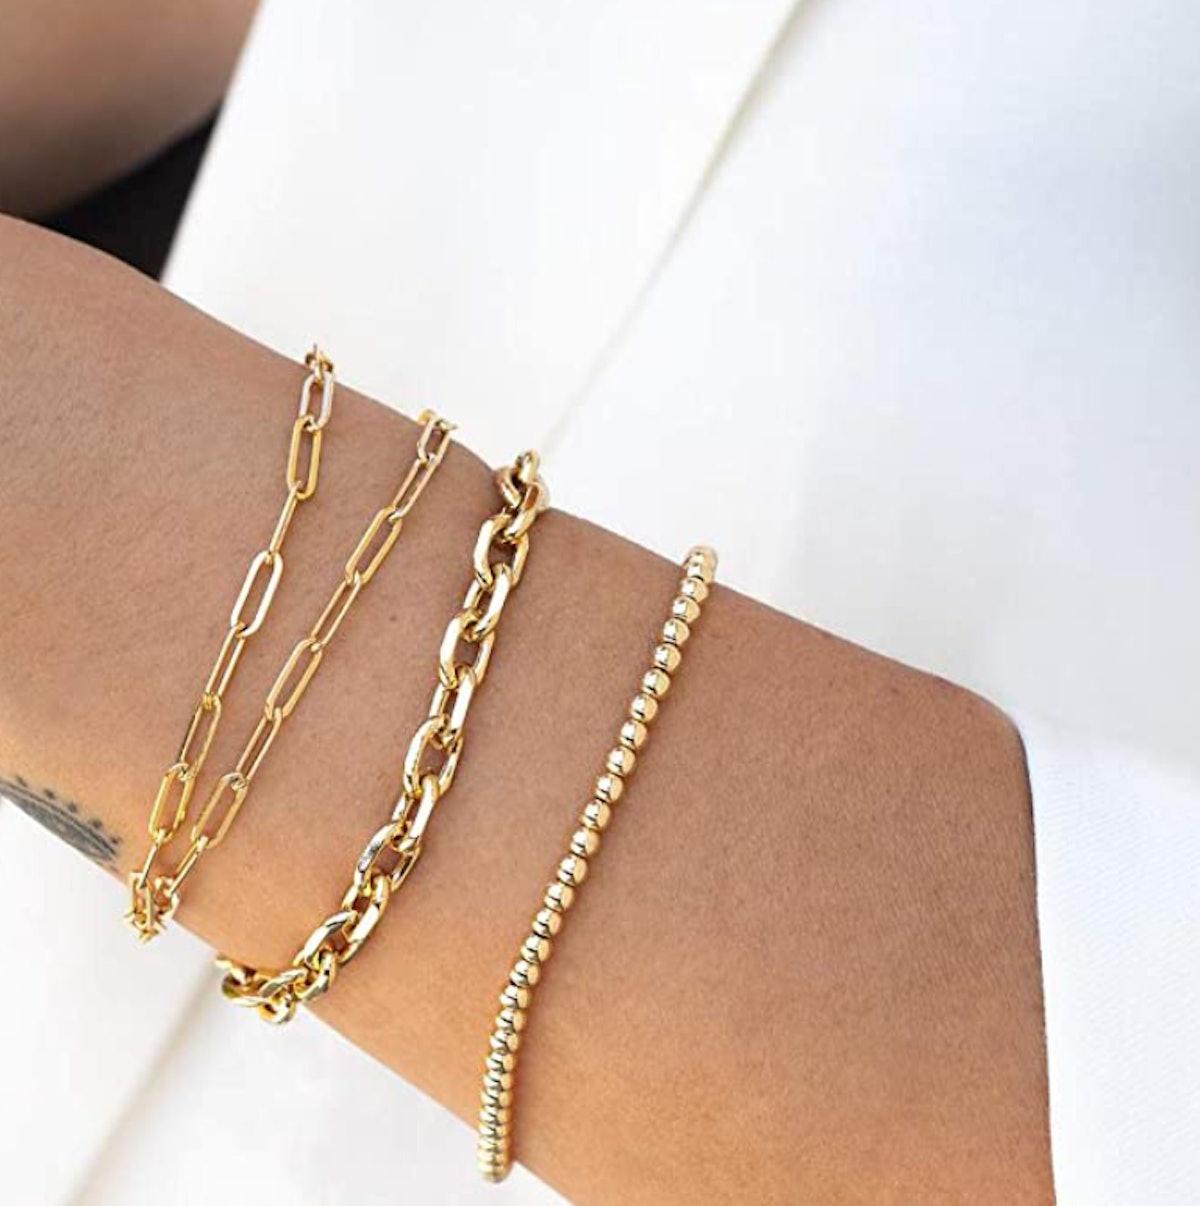 Mevecco Gold Plated Paperclip Link Bracelet